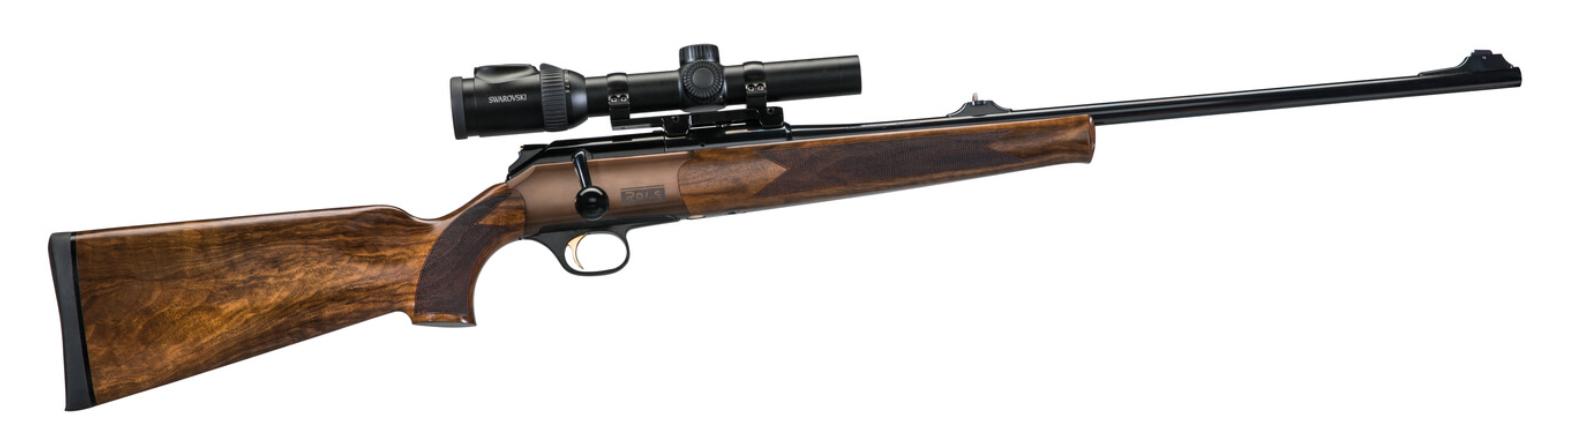 chapuis rols classic carabina da caccia